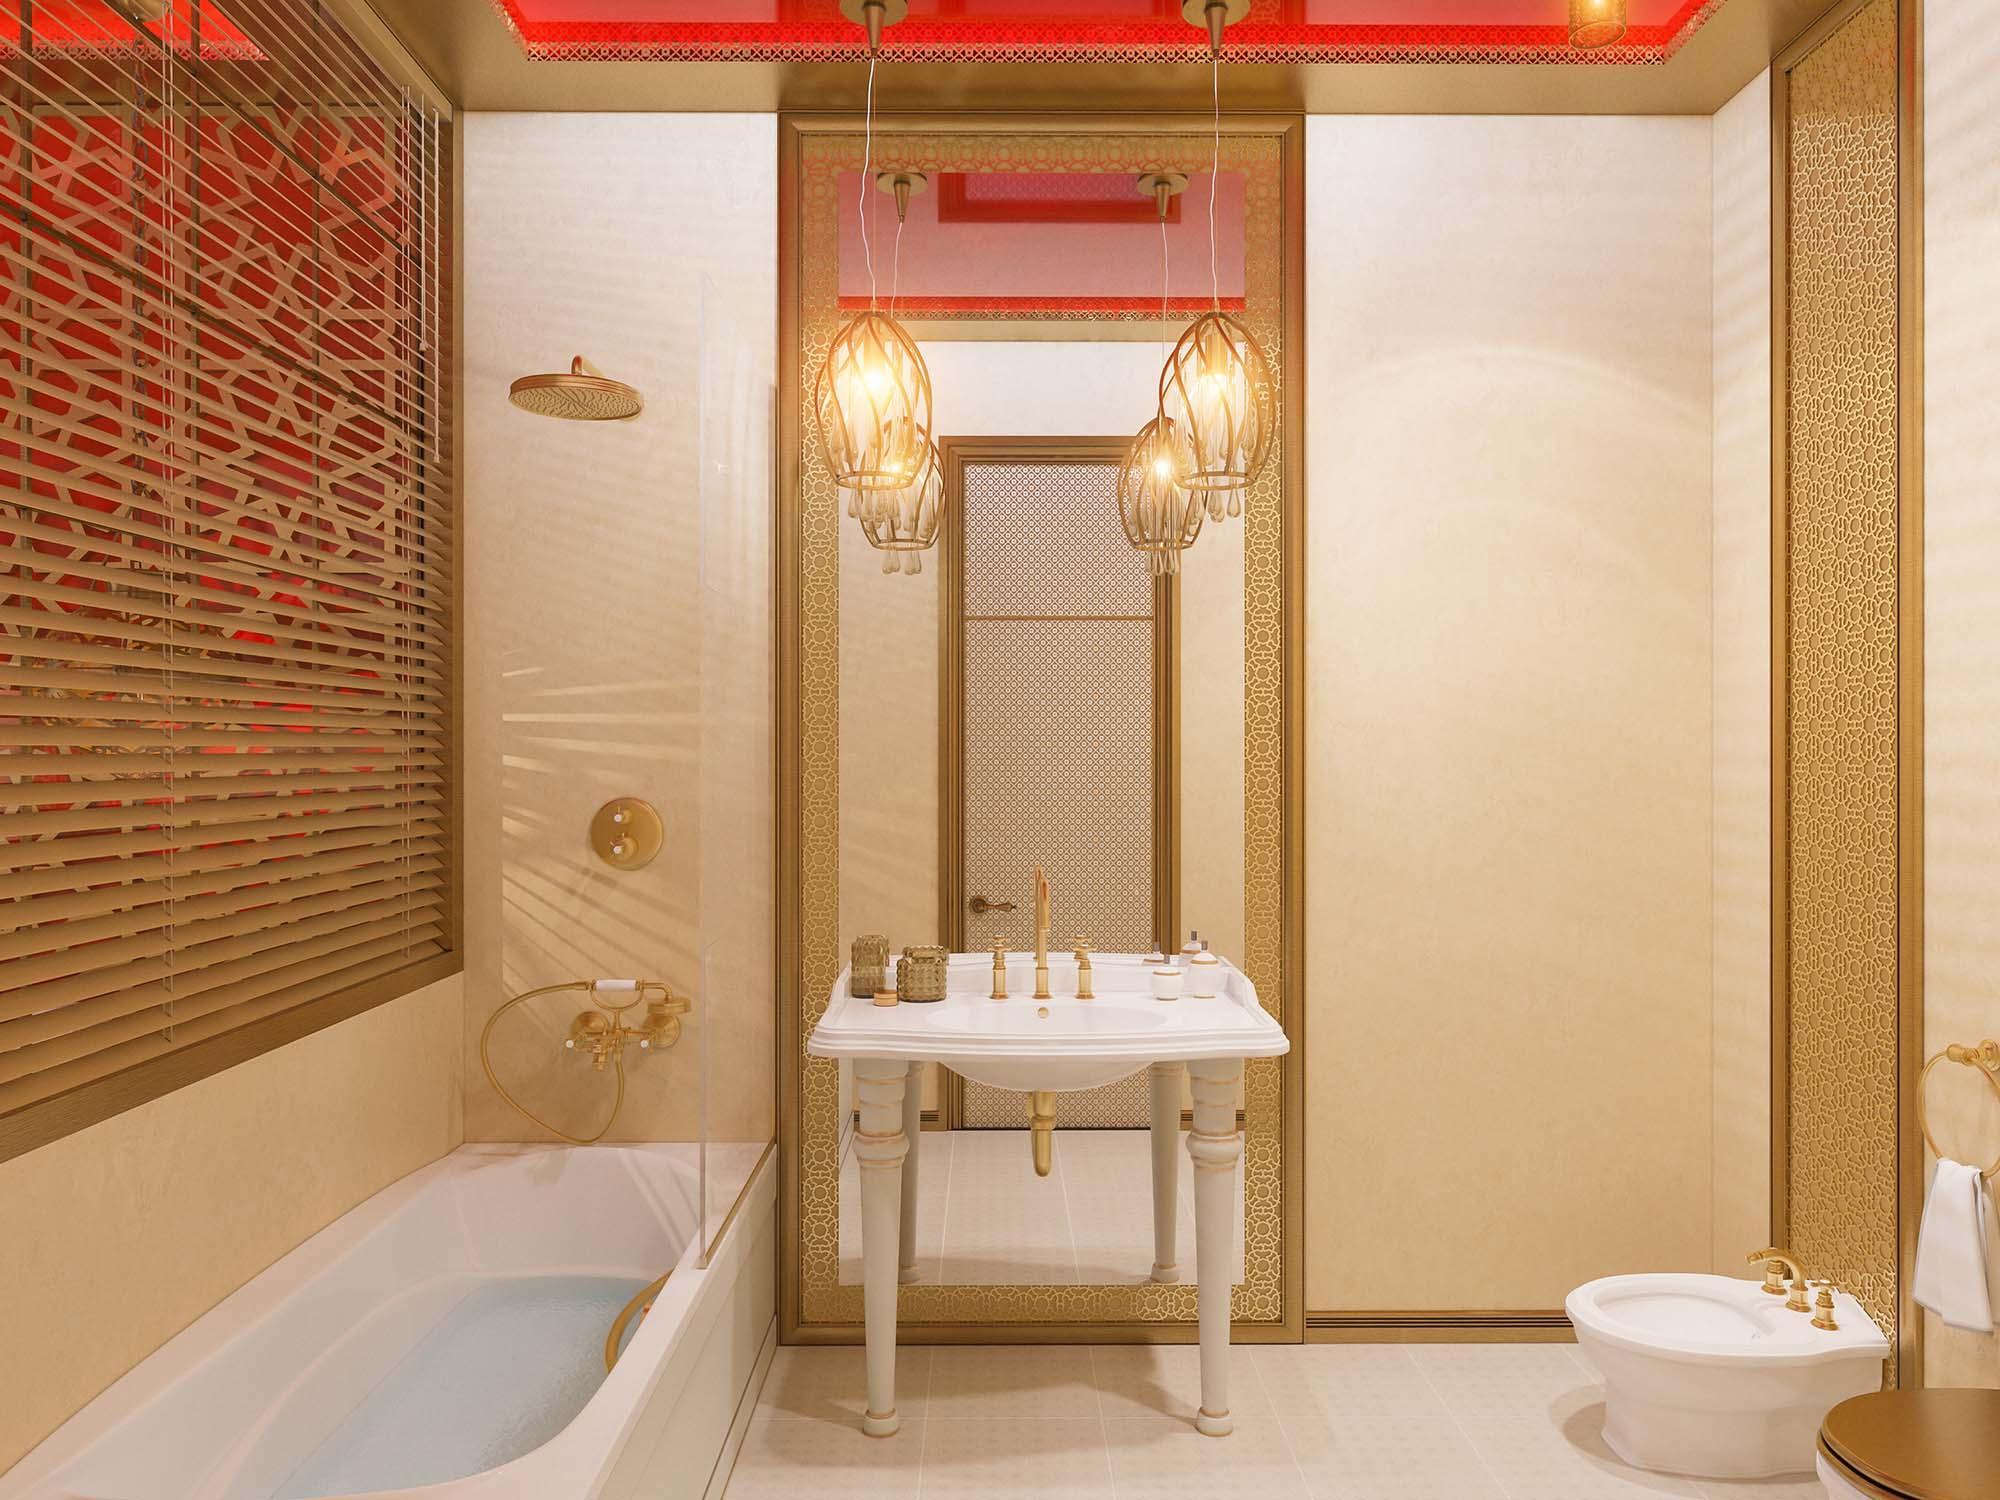 Morocco_bathroom